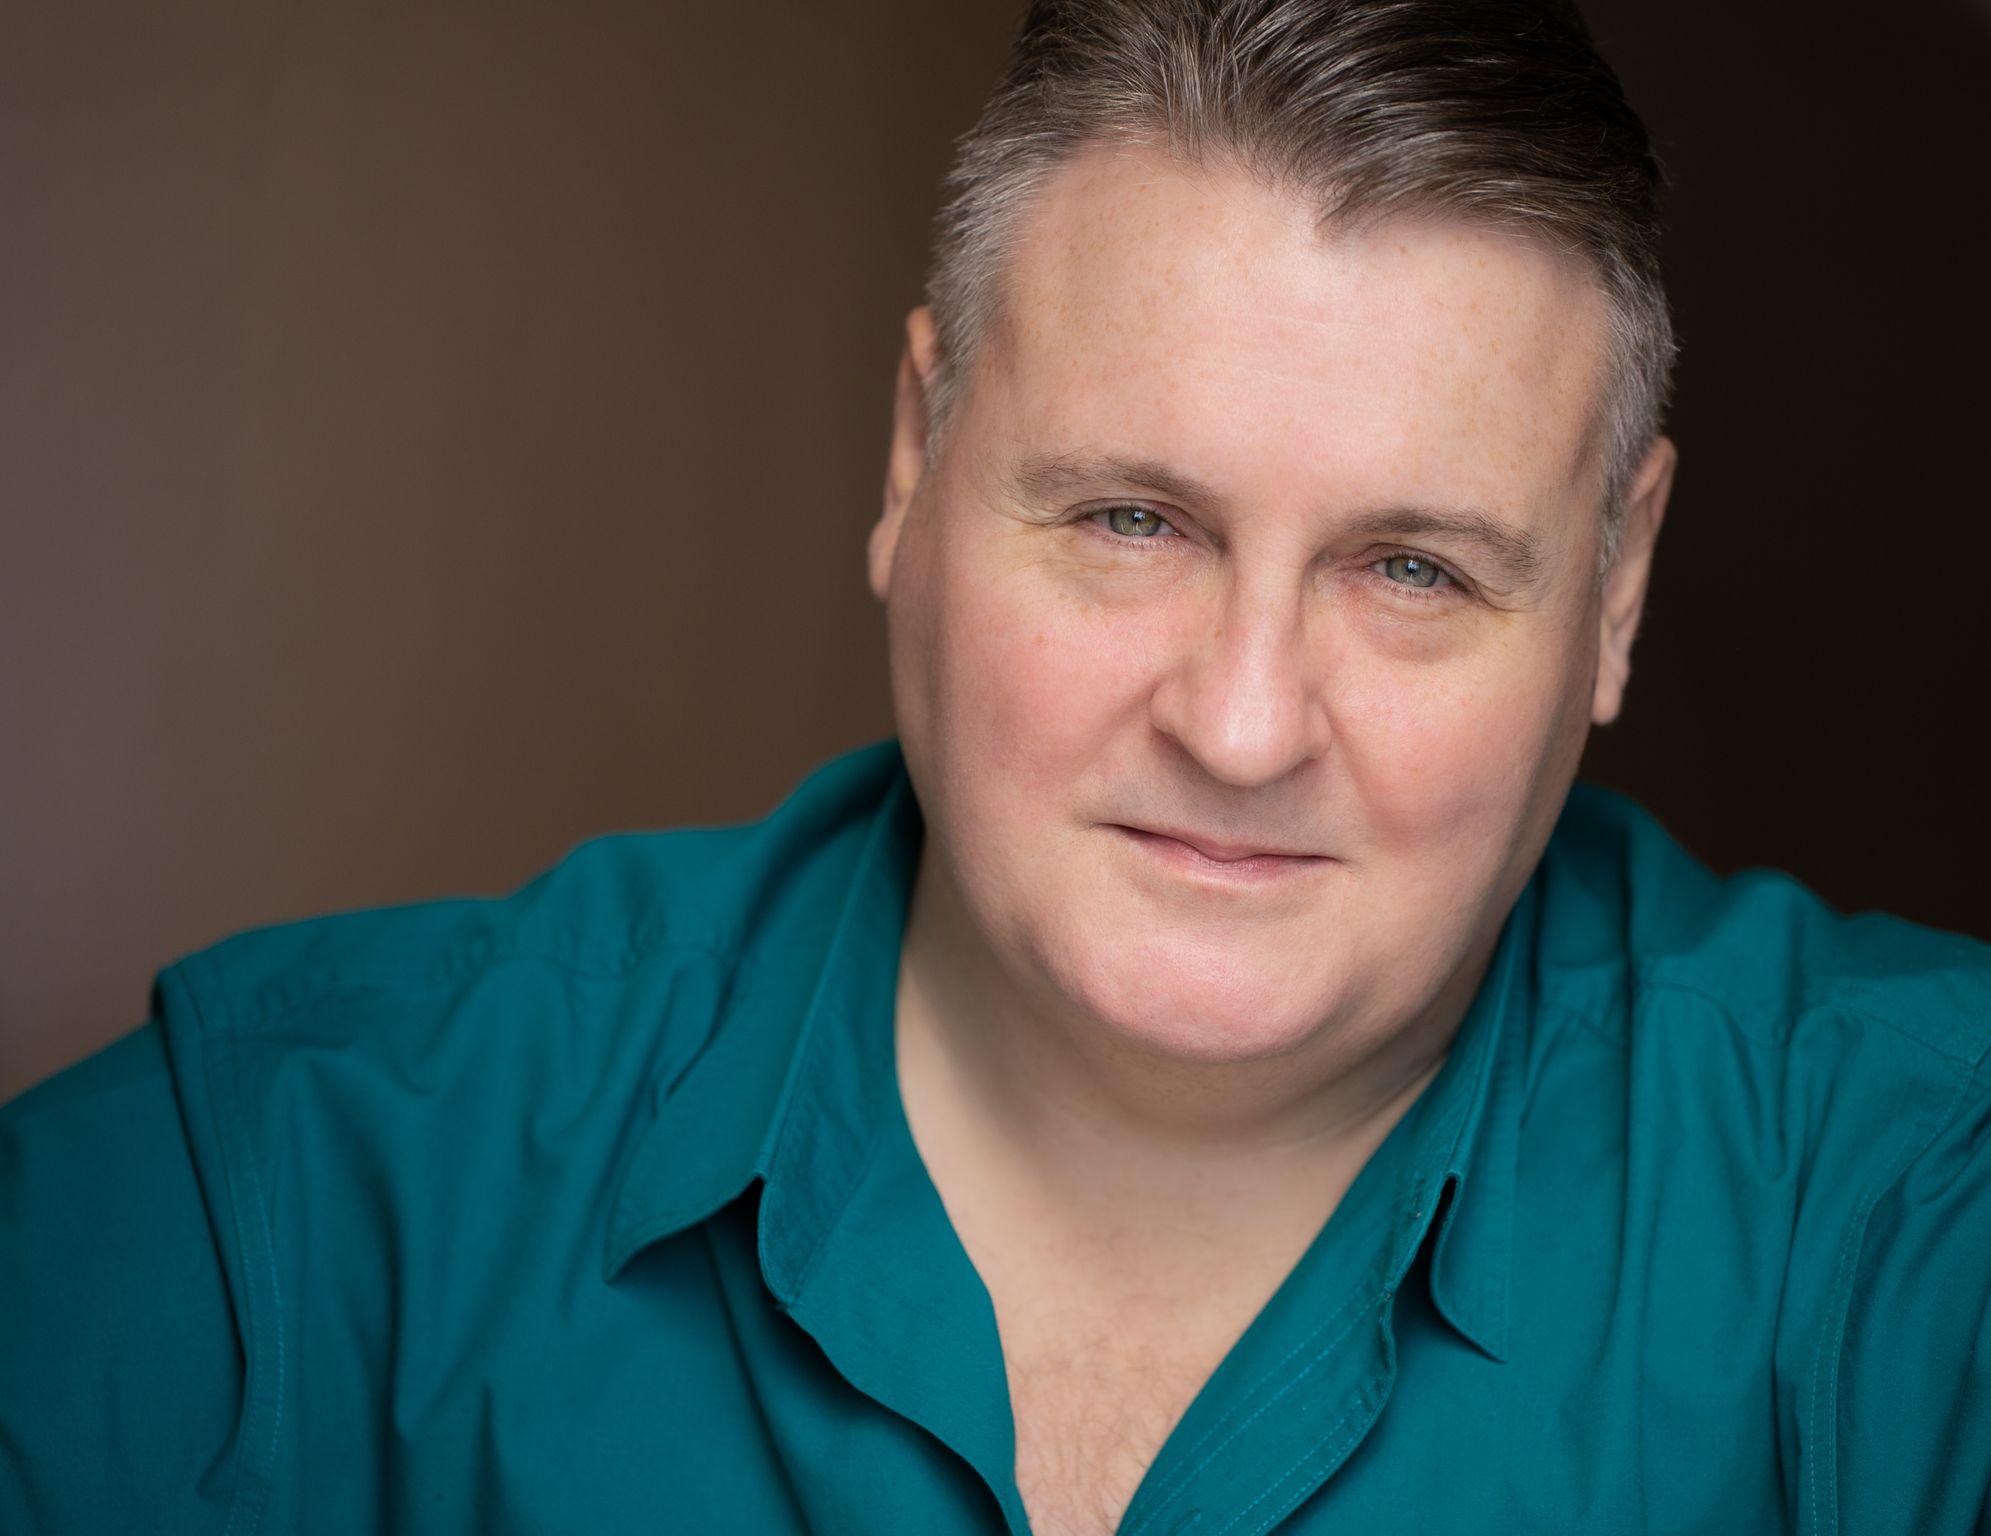 Actor Michael Walters